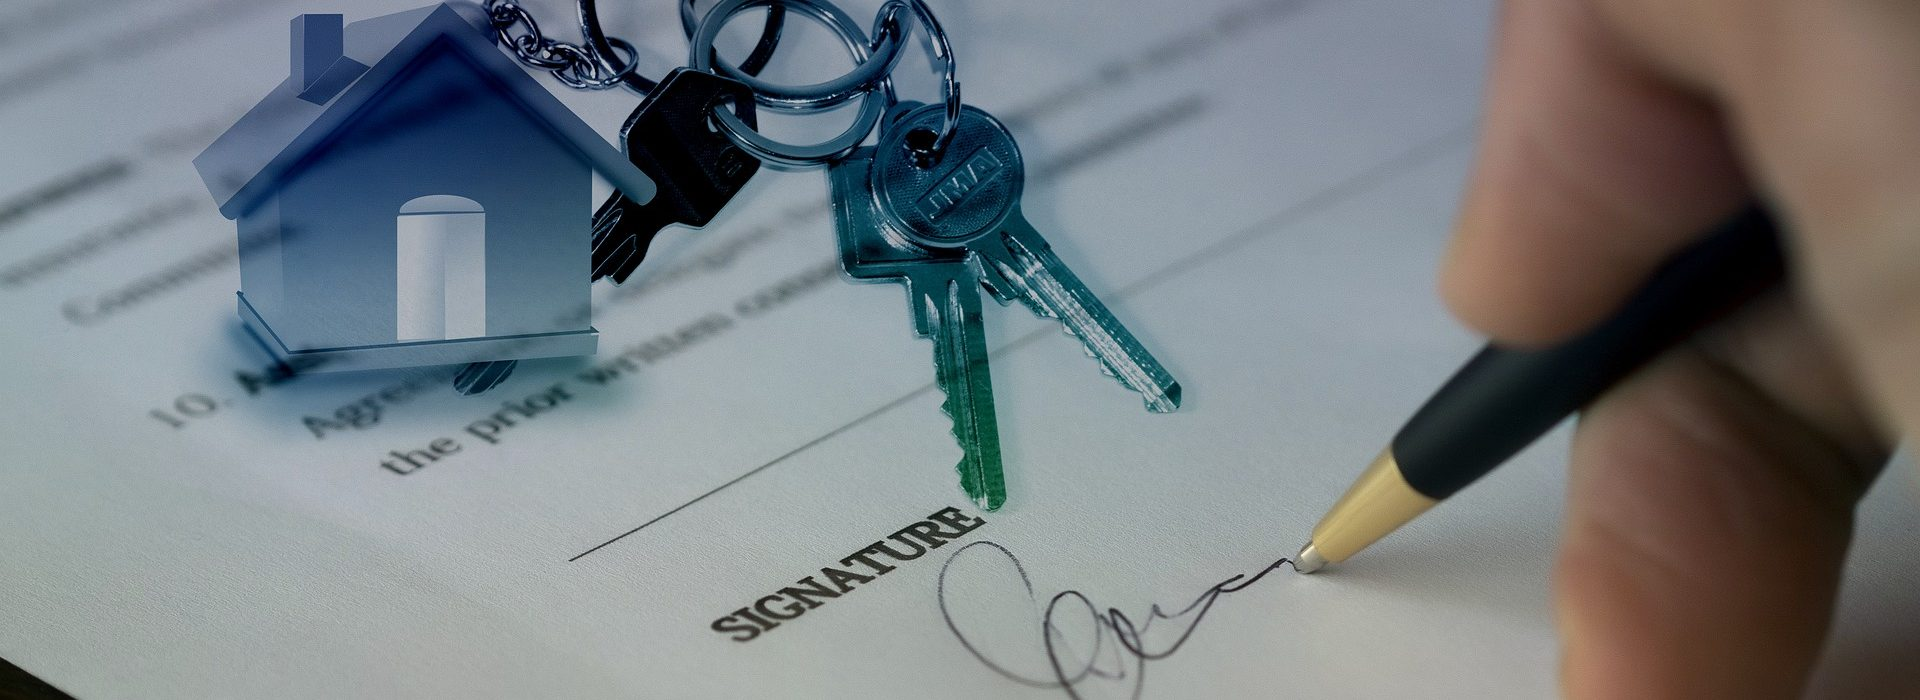 Immobilienbranche: Bestellerprinzip